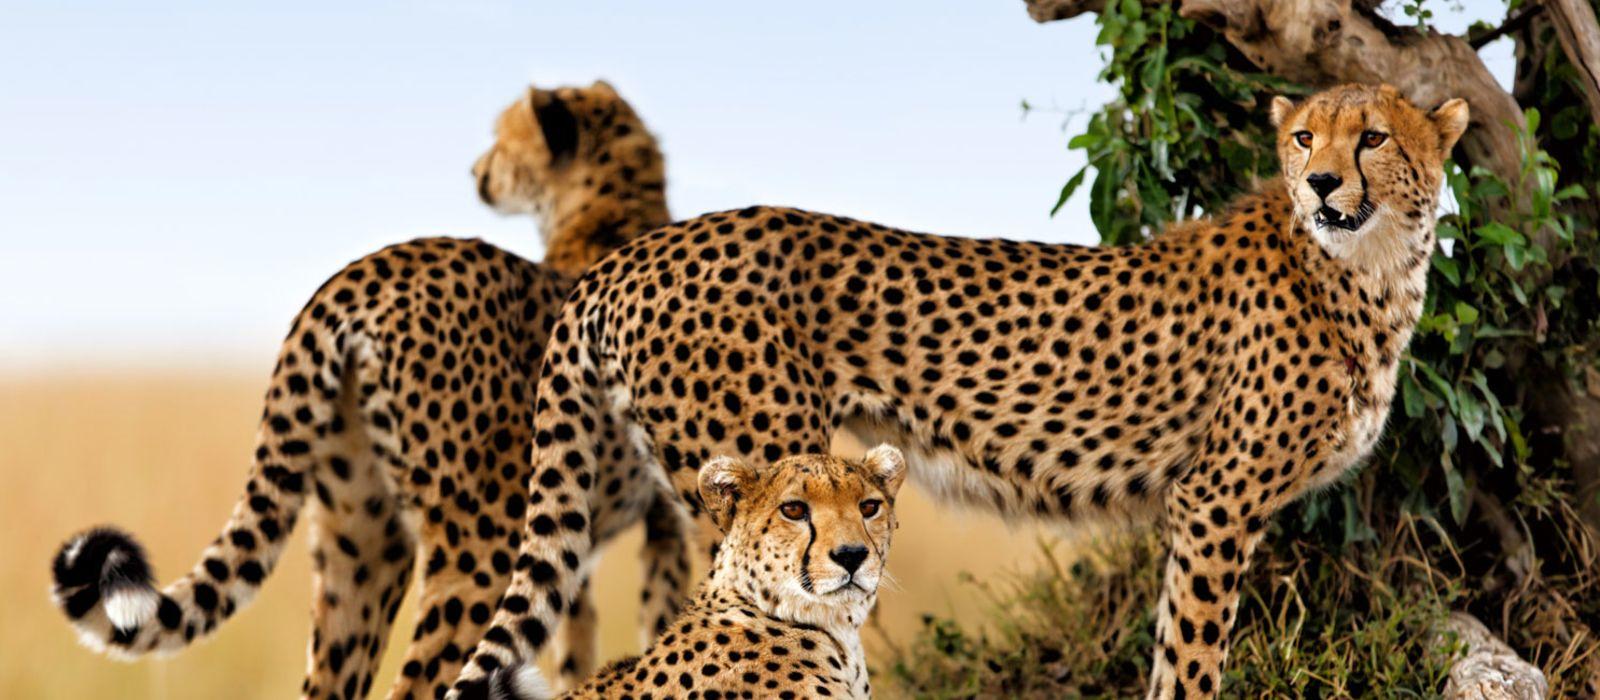 Kenia: Wandersafari & Strand Urlaub 1